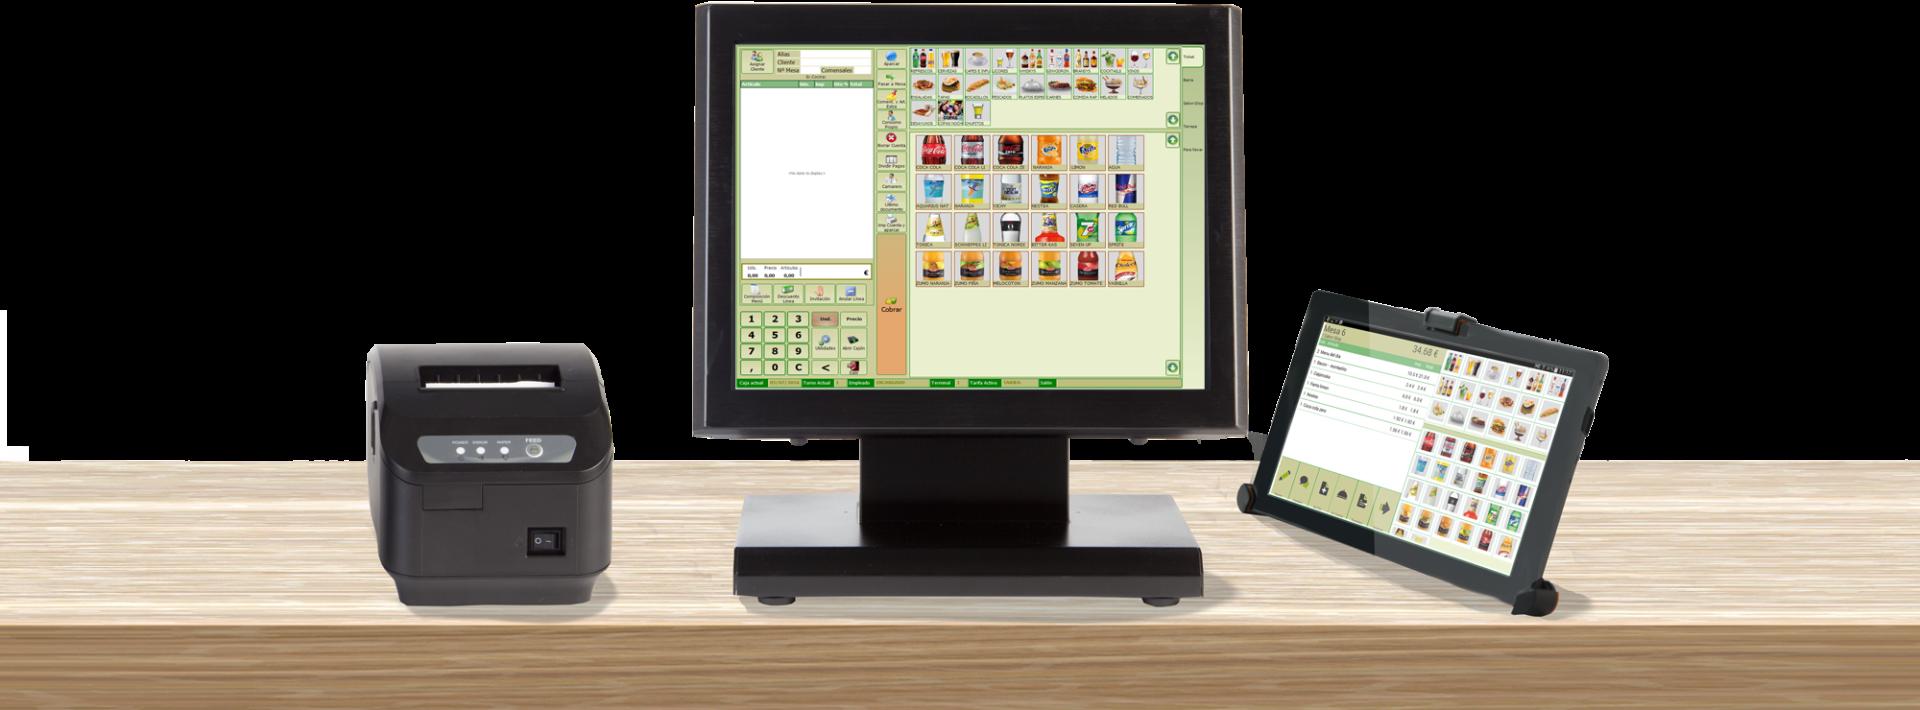 pantalla glop software tpv